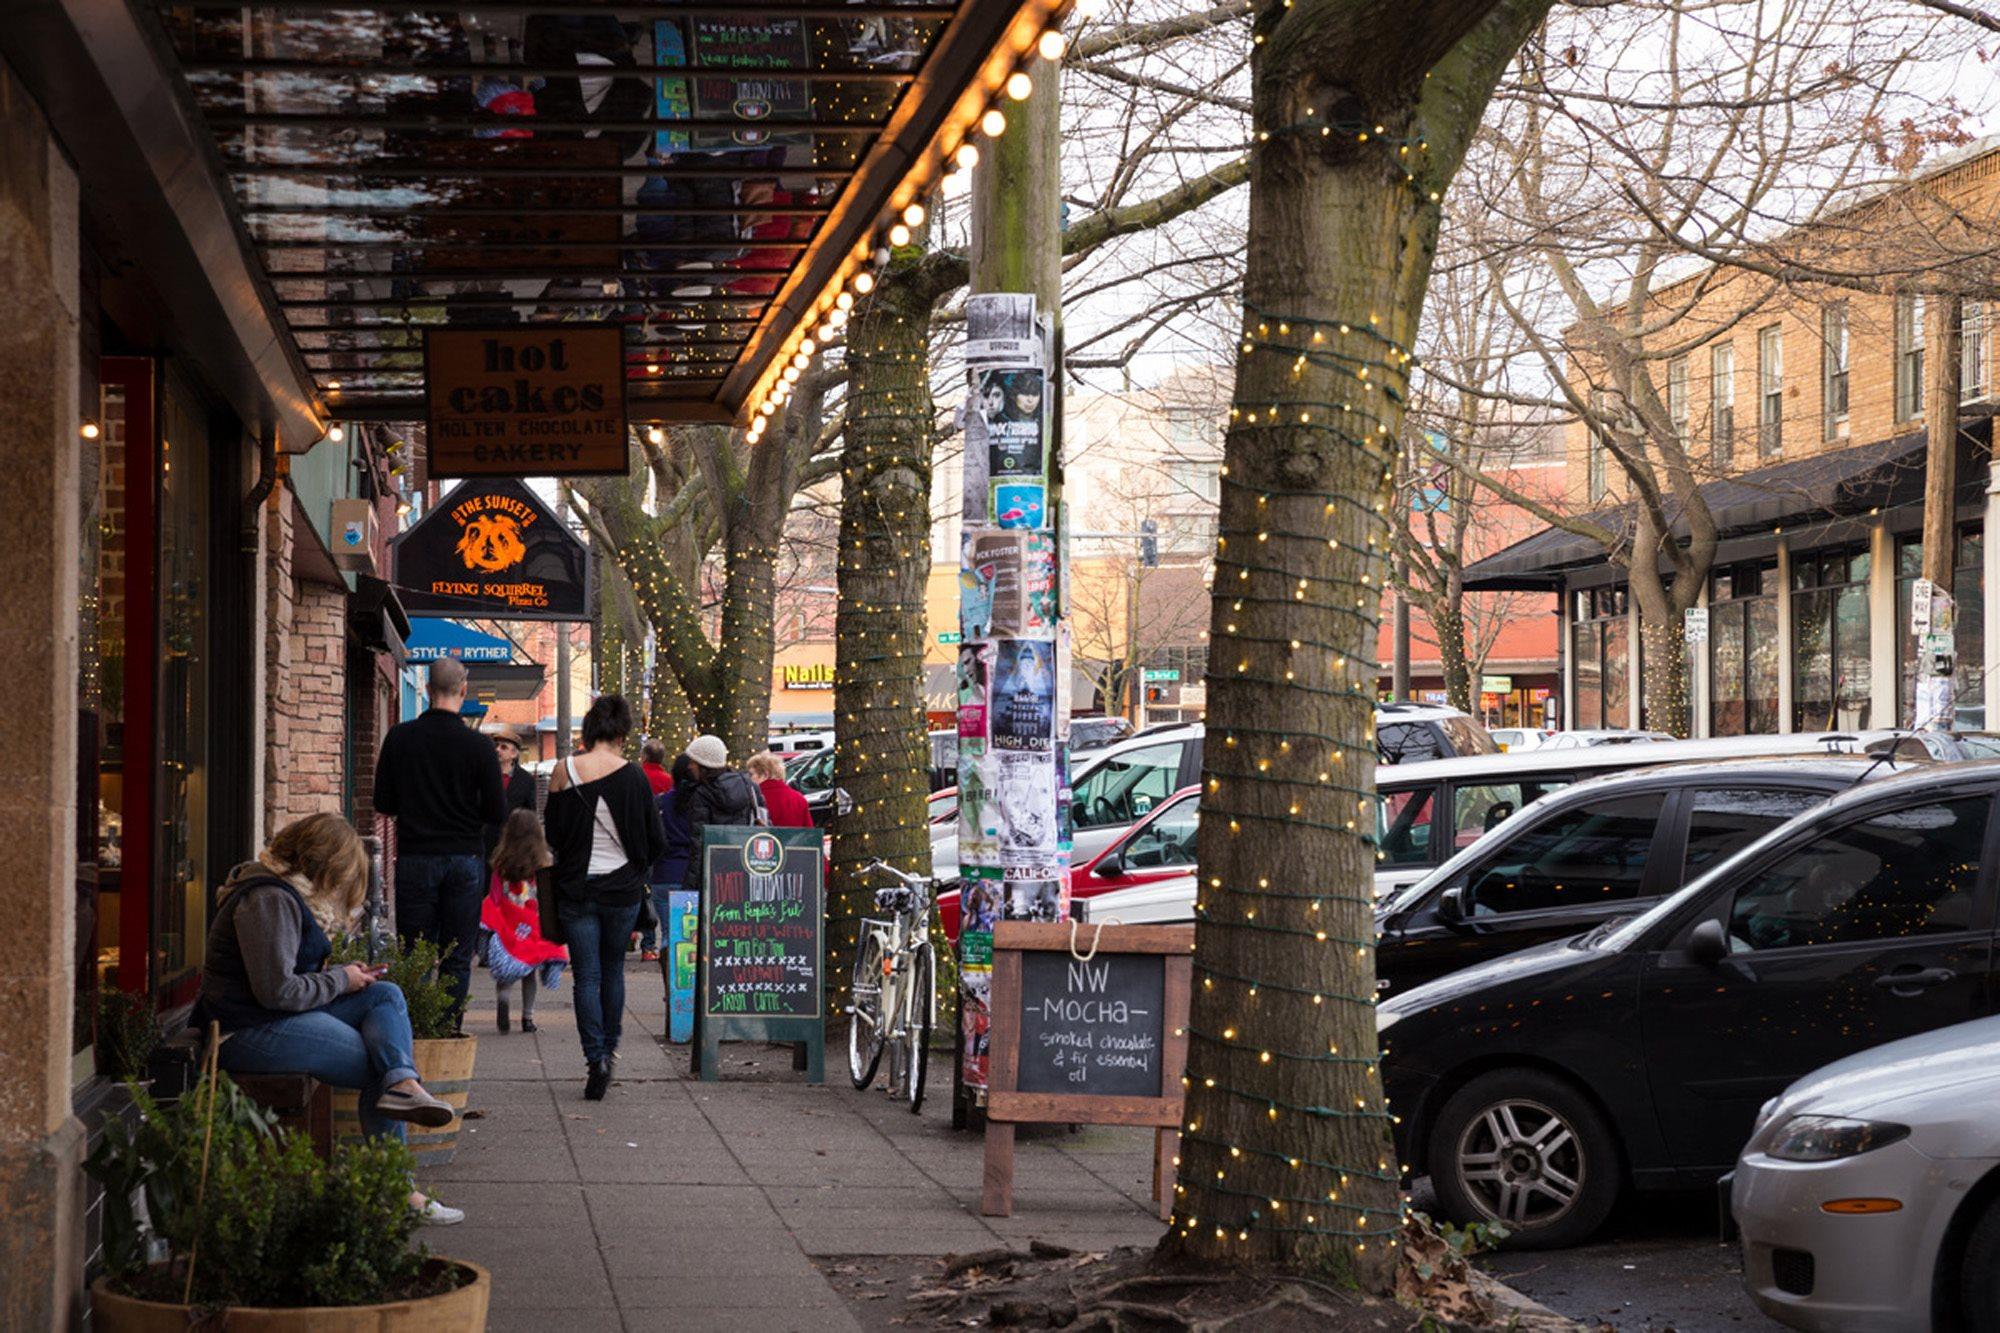 Seattle photogallery 58